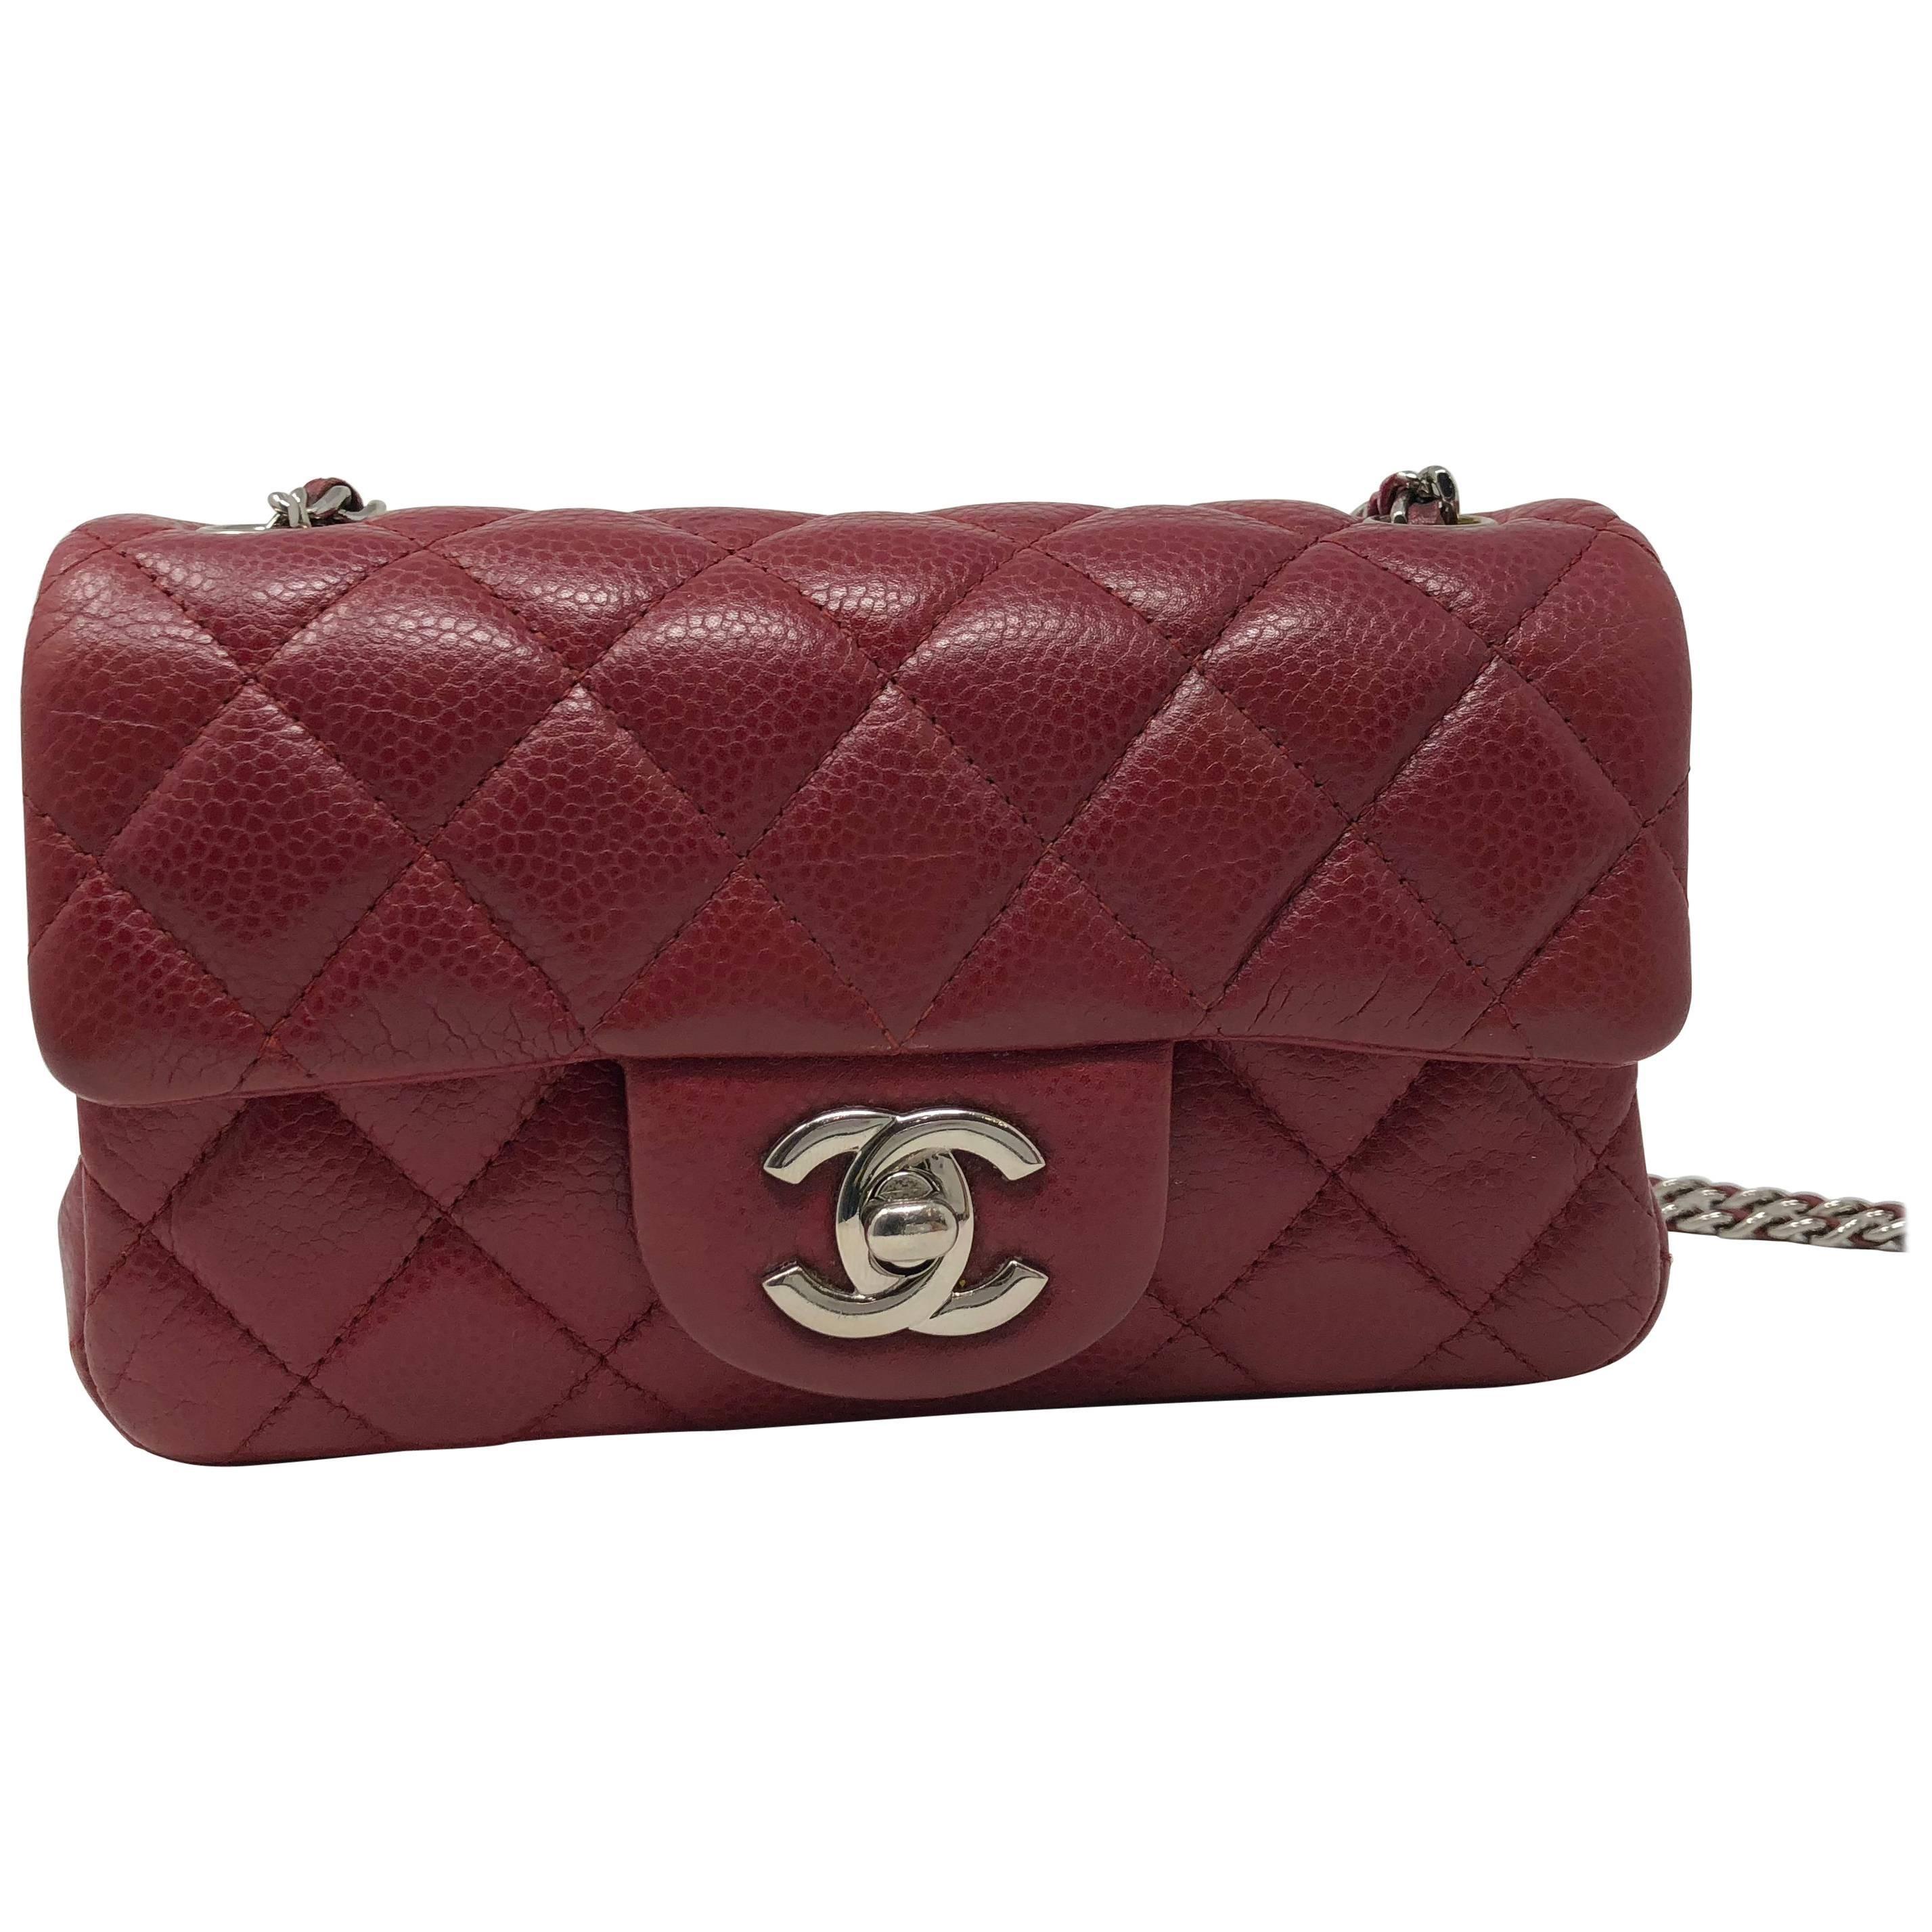 2fe11cd9baa8 Red Chanel Mini Mini Leather Crossbody Bag at 1stdibs